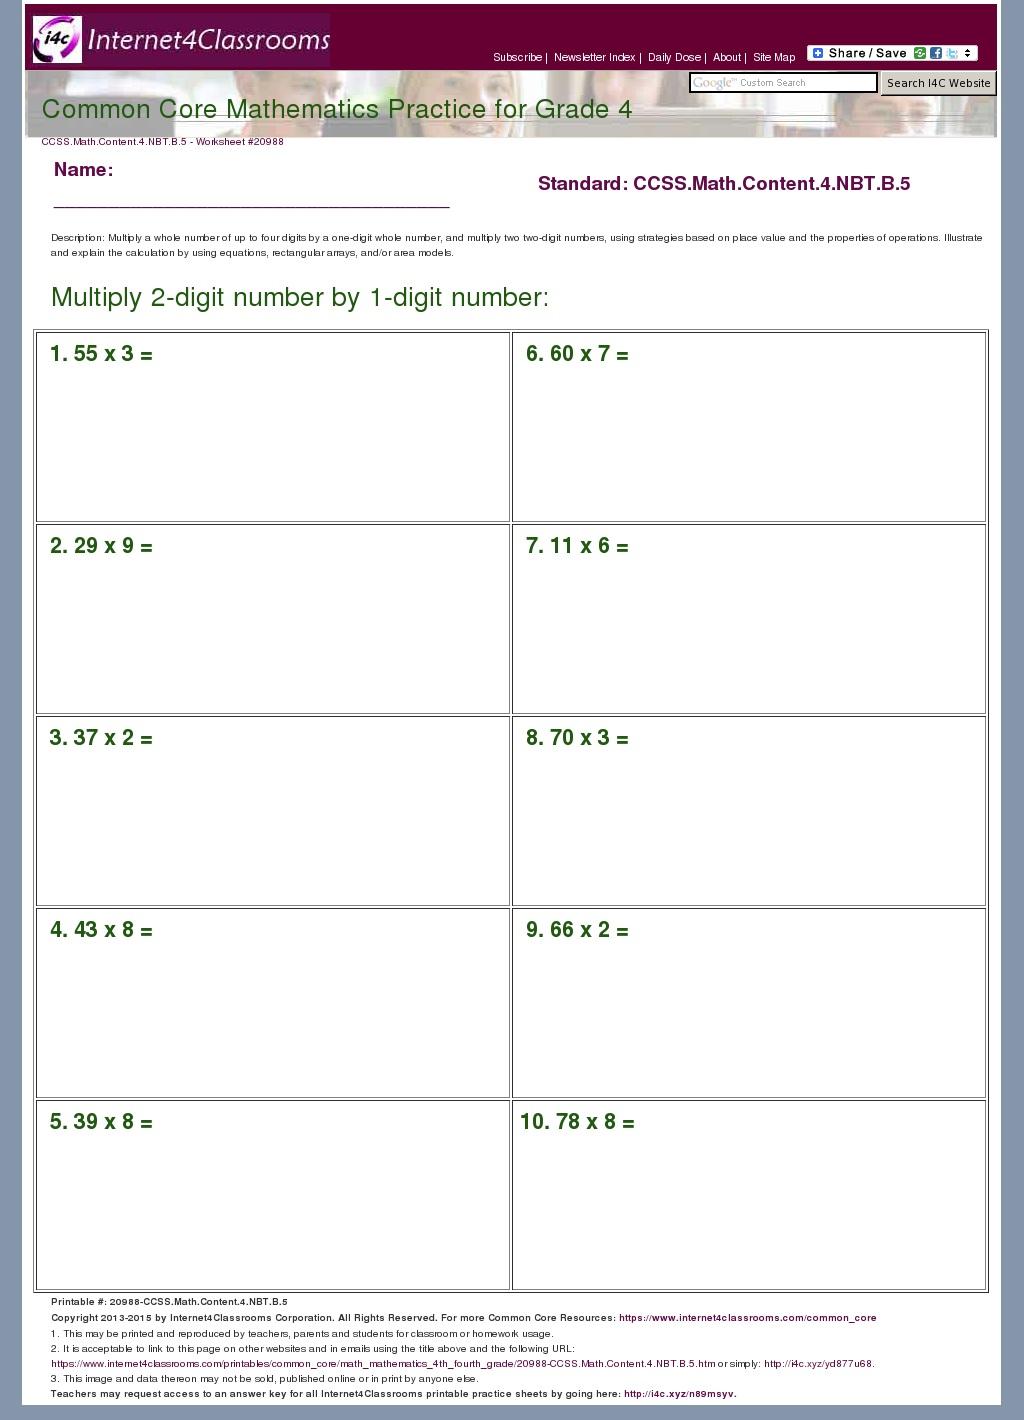 Description/Download - Worksheet #20988, CCSS.Math.Content.4.NBT.B.5 Grade 4  Mathematics Common Core